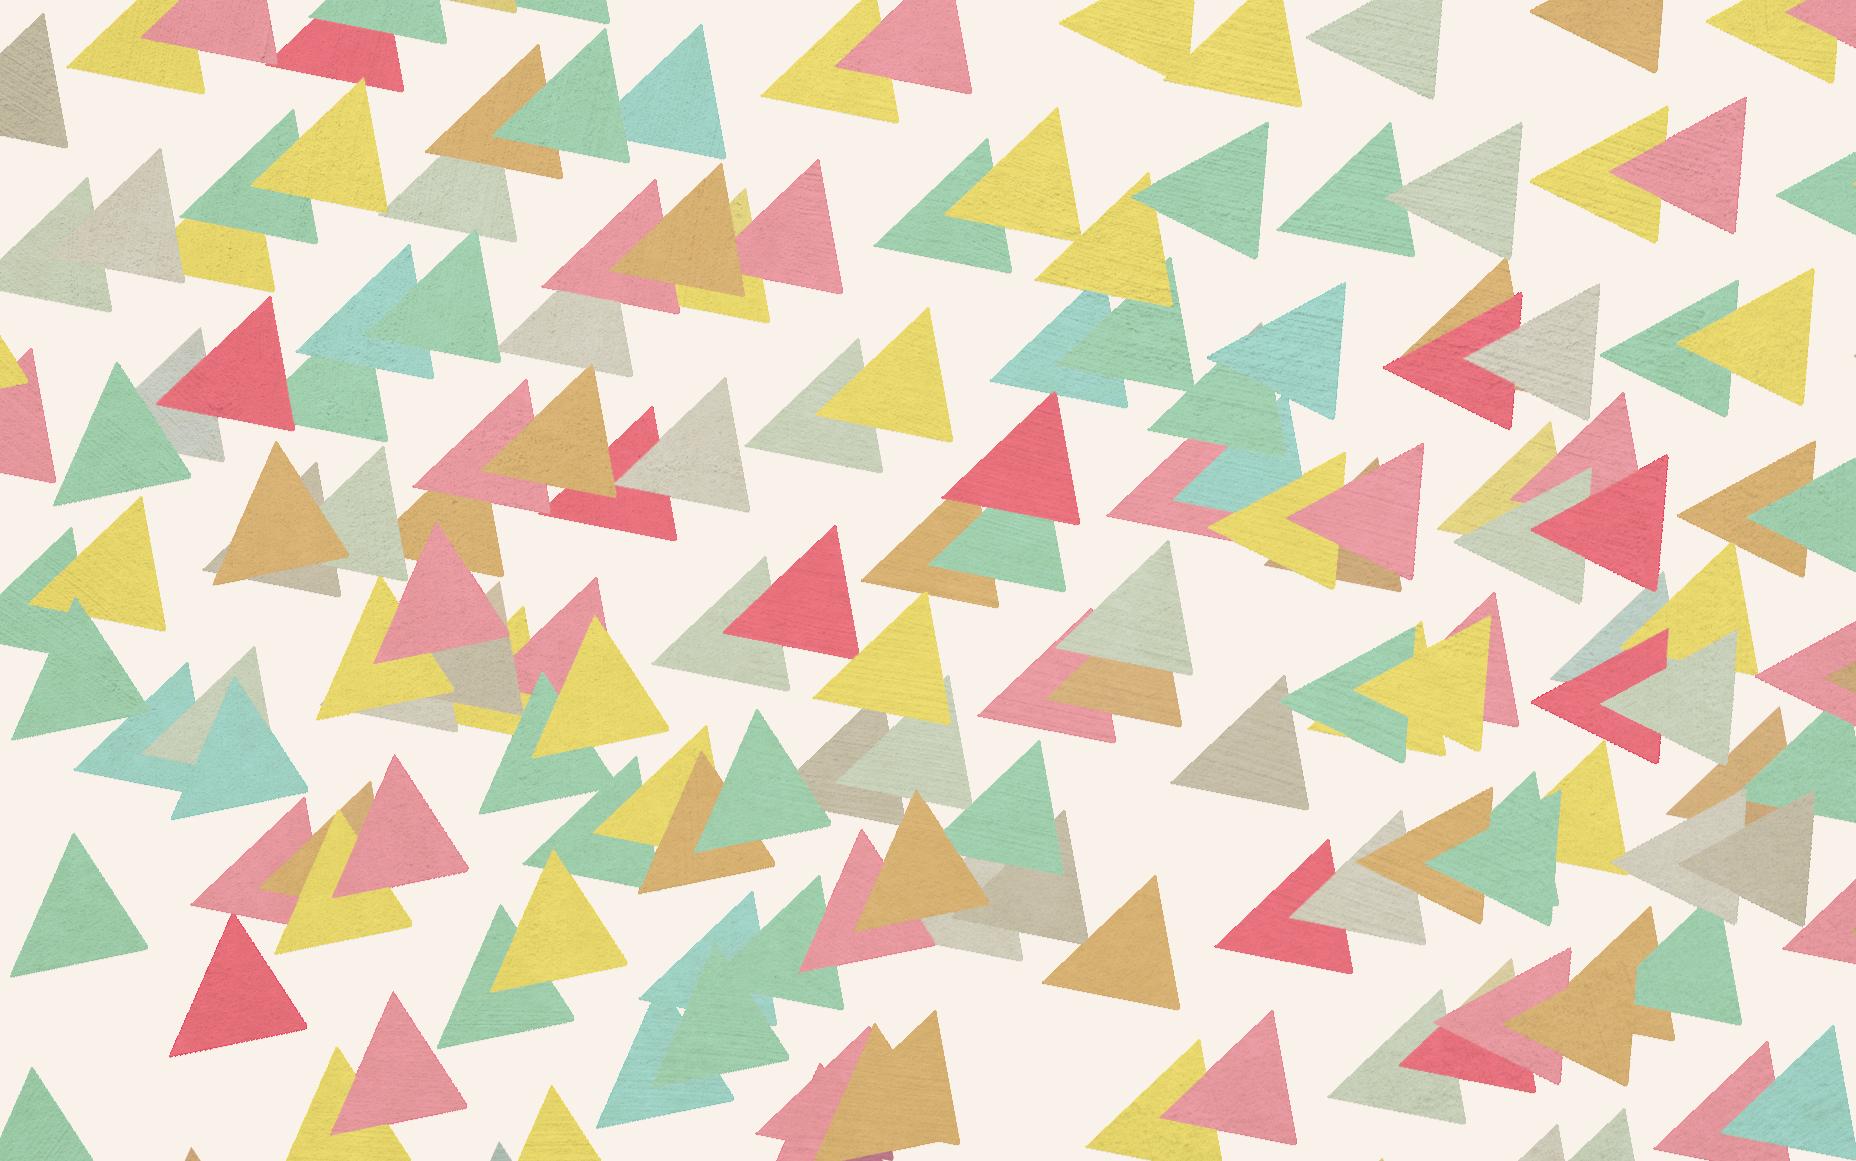 Love fest wallpaper backgrounds and desktop wallpapers on pinterest - Desktop Wallpapers Pinterest Wallpapersafari